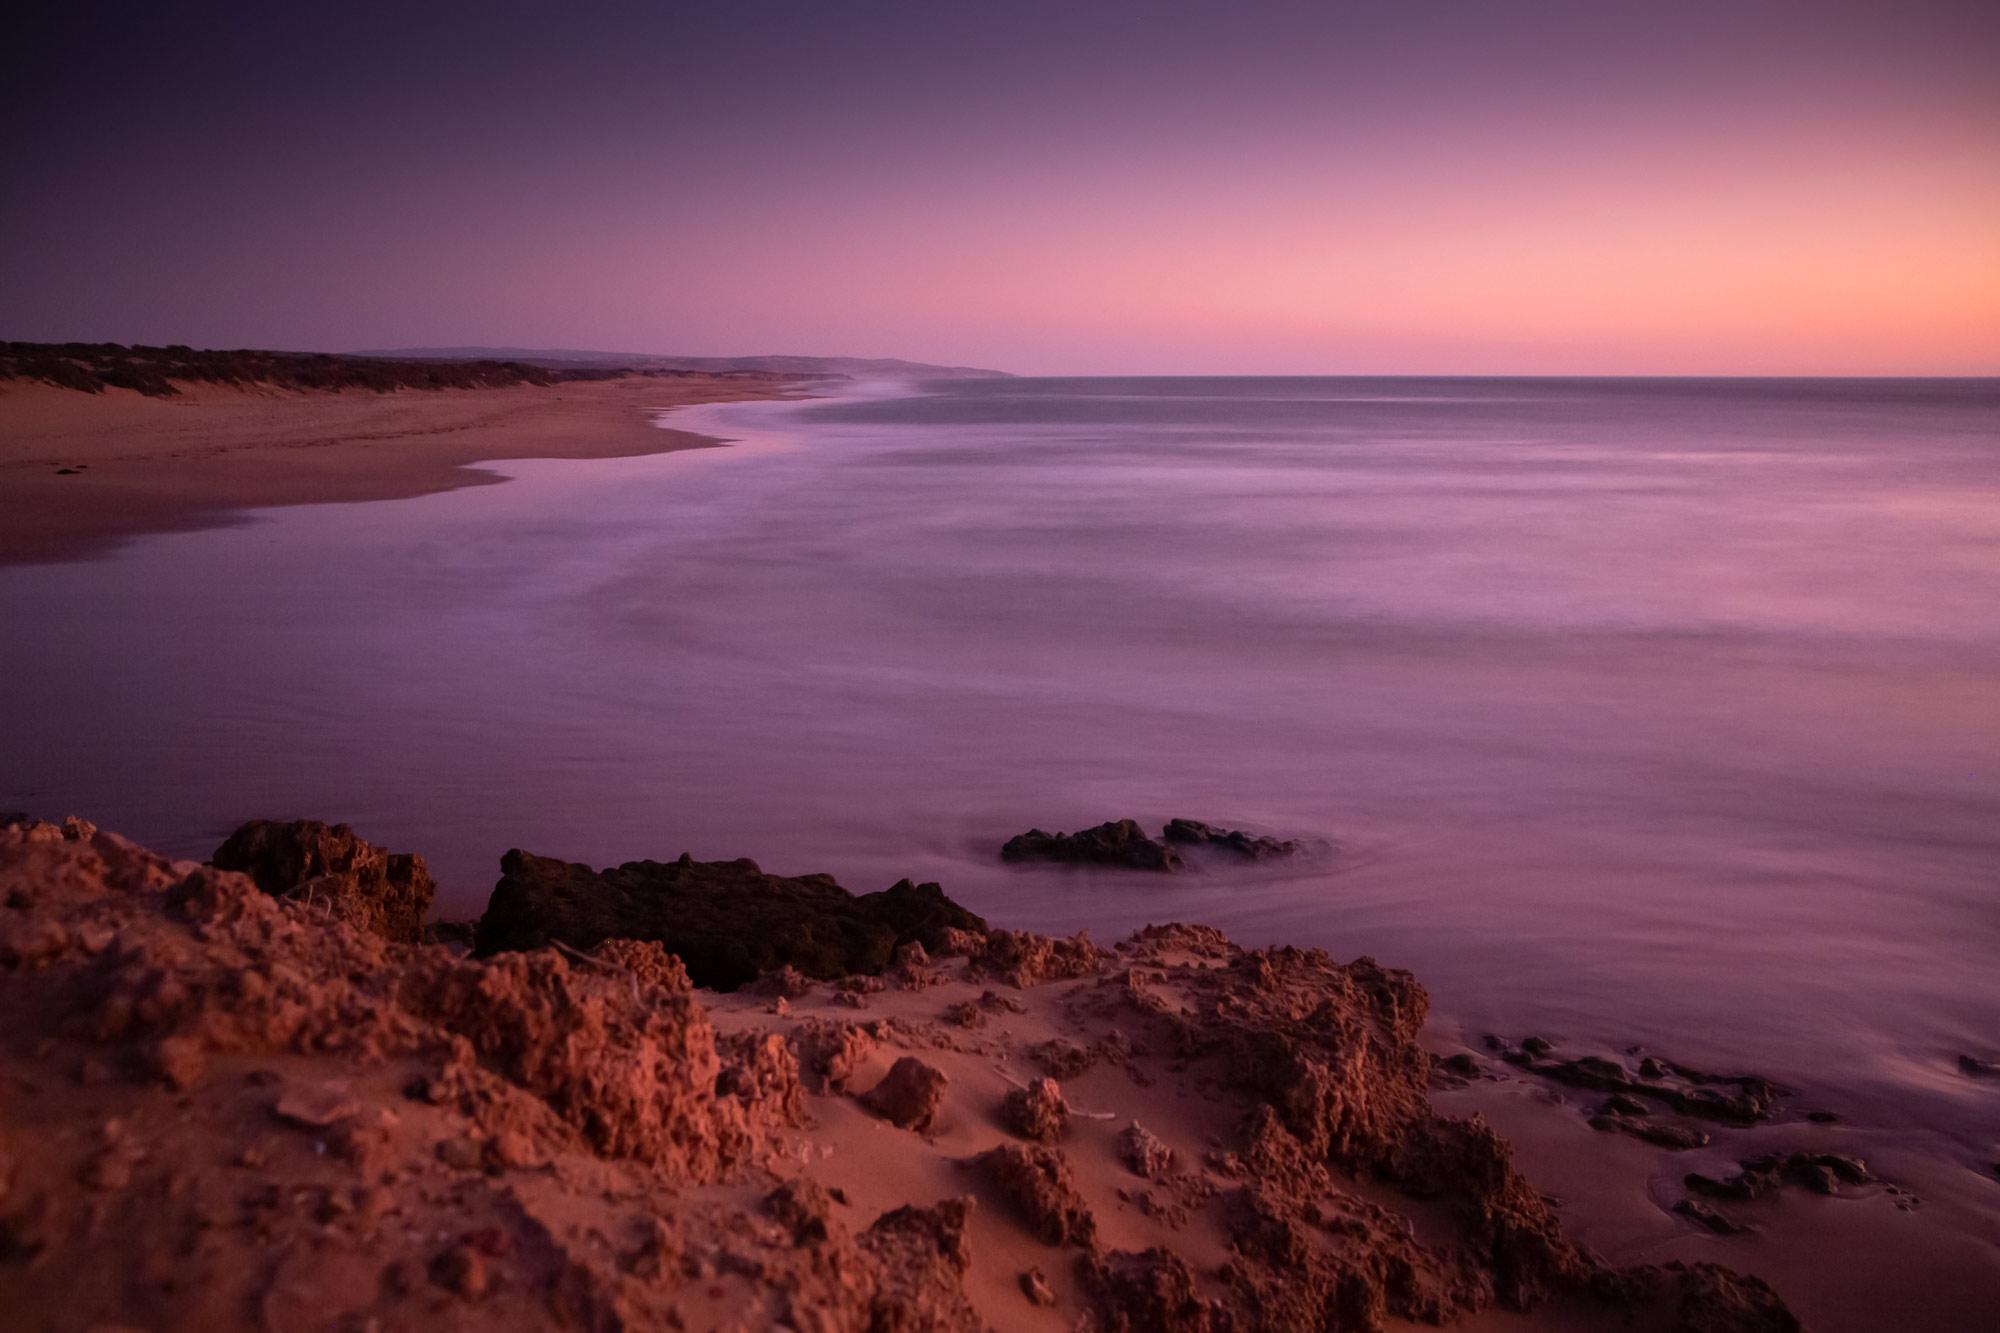 Trek au Maroc plage Sidi Kaouki